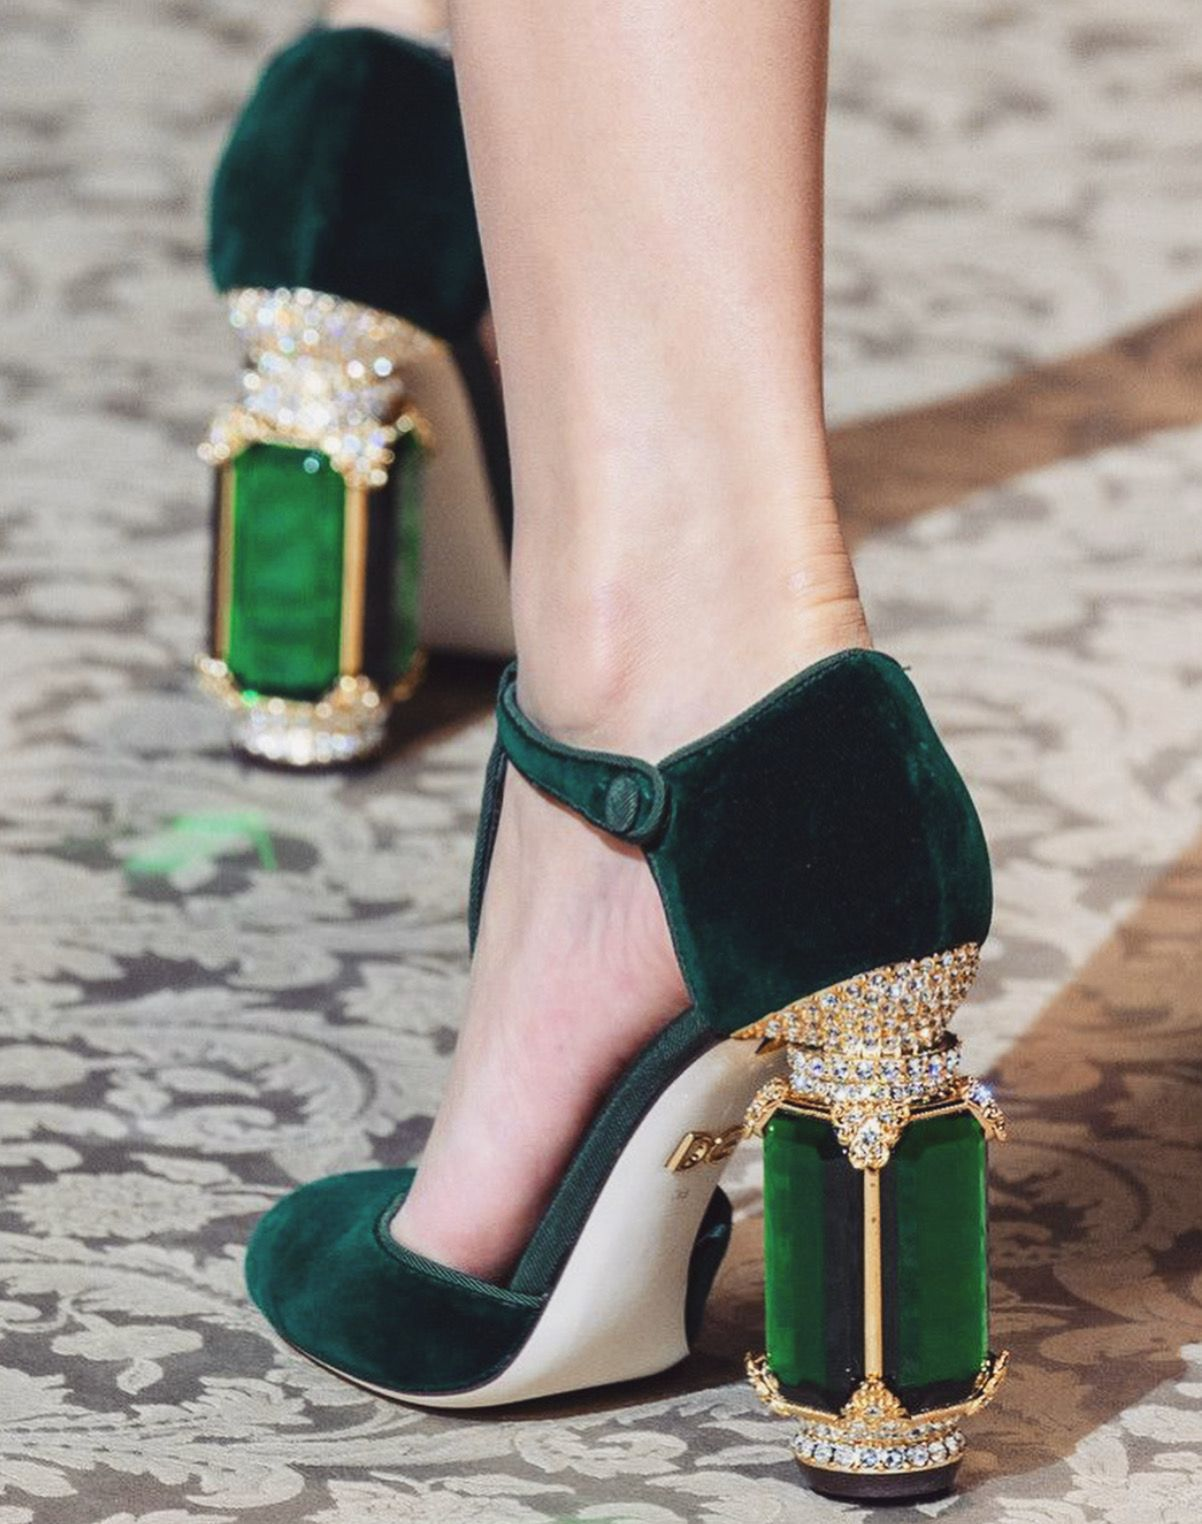 f7aec01a7066b Dolce & Gabbana F/W 2018 | Shoes | Shoes, Fashion, Shoe boots